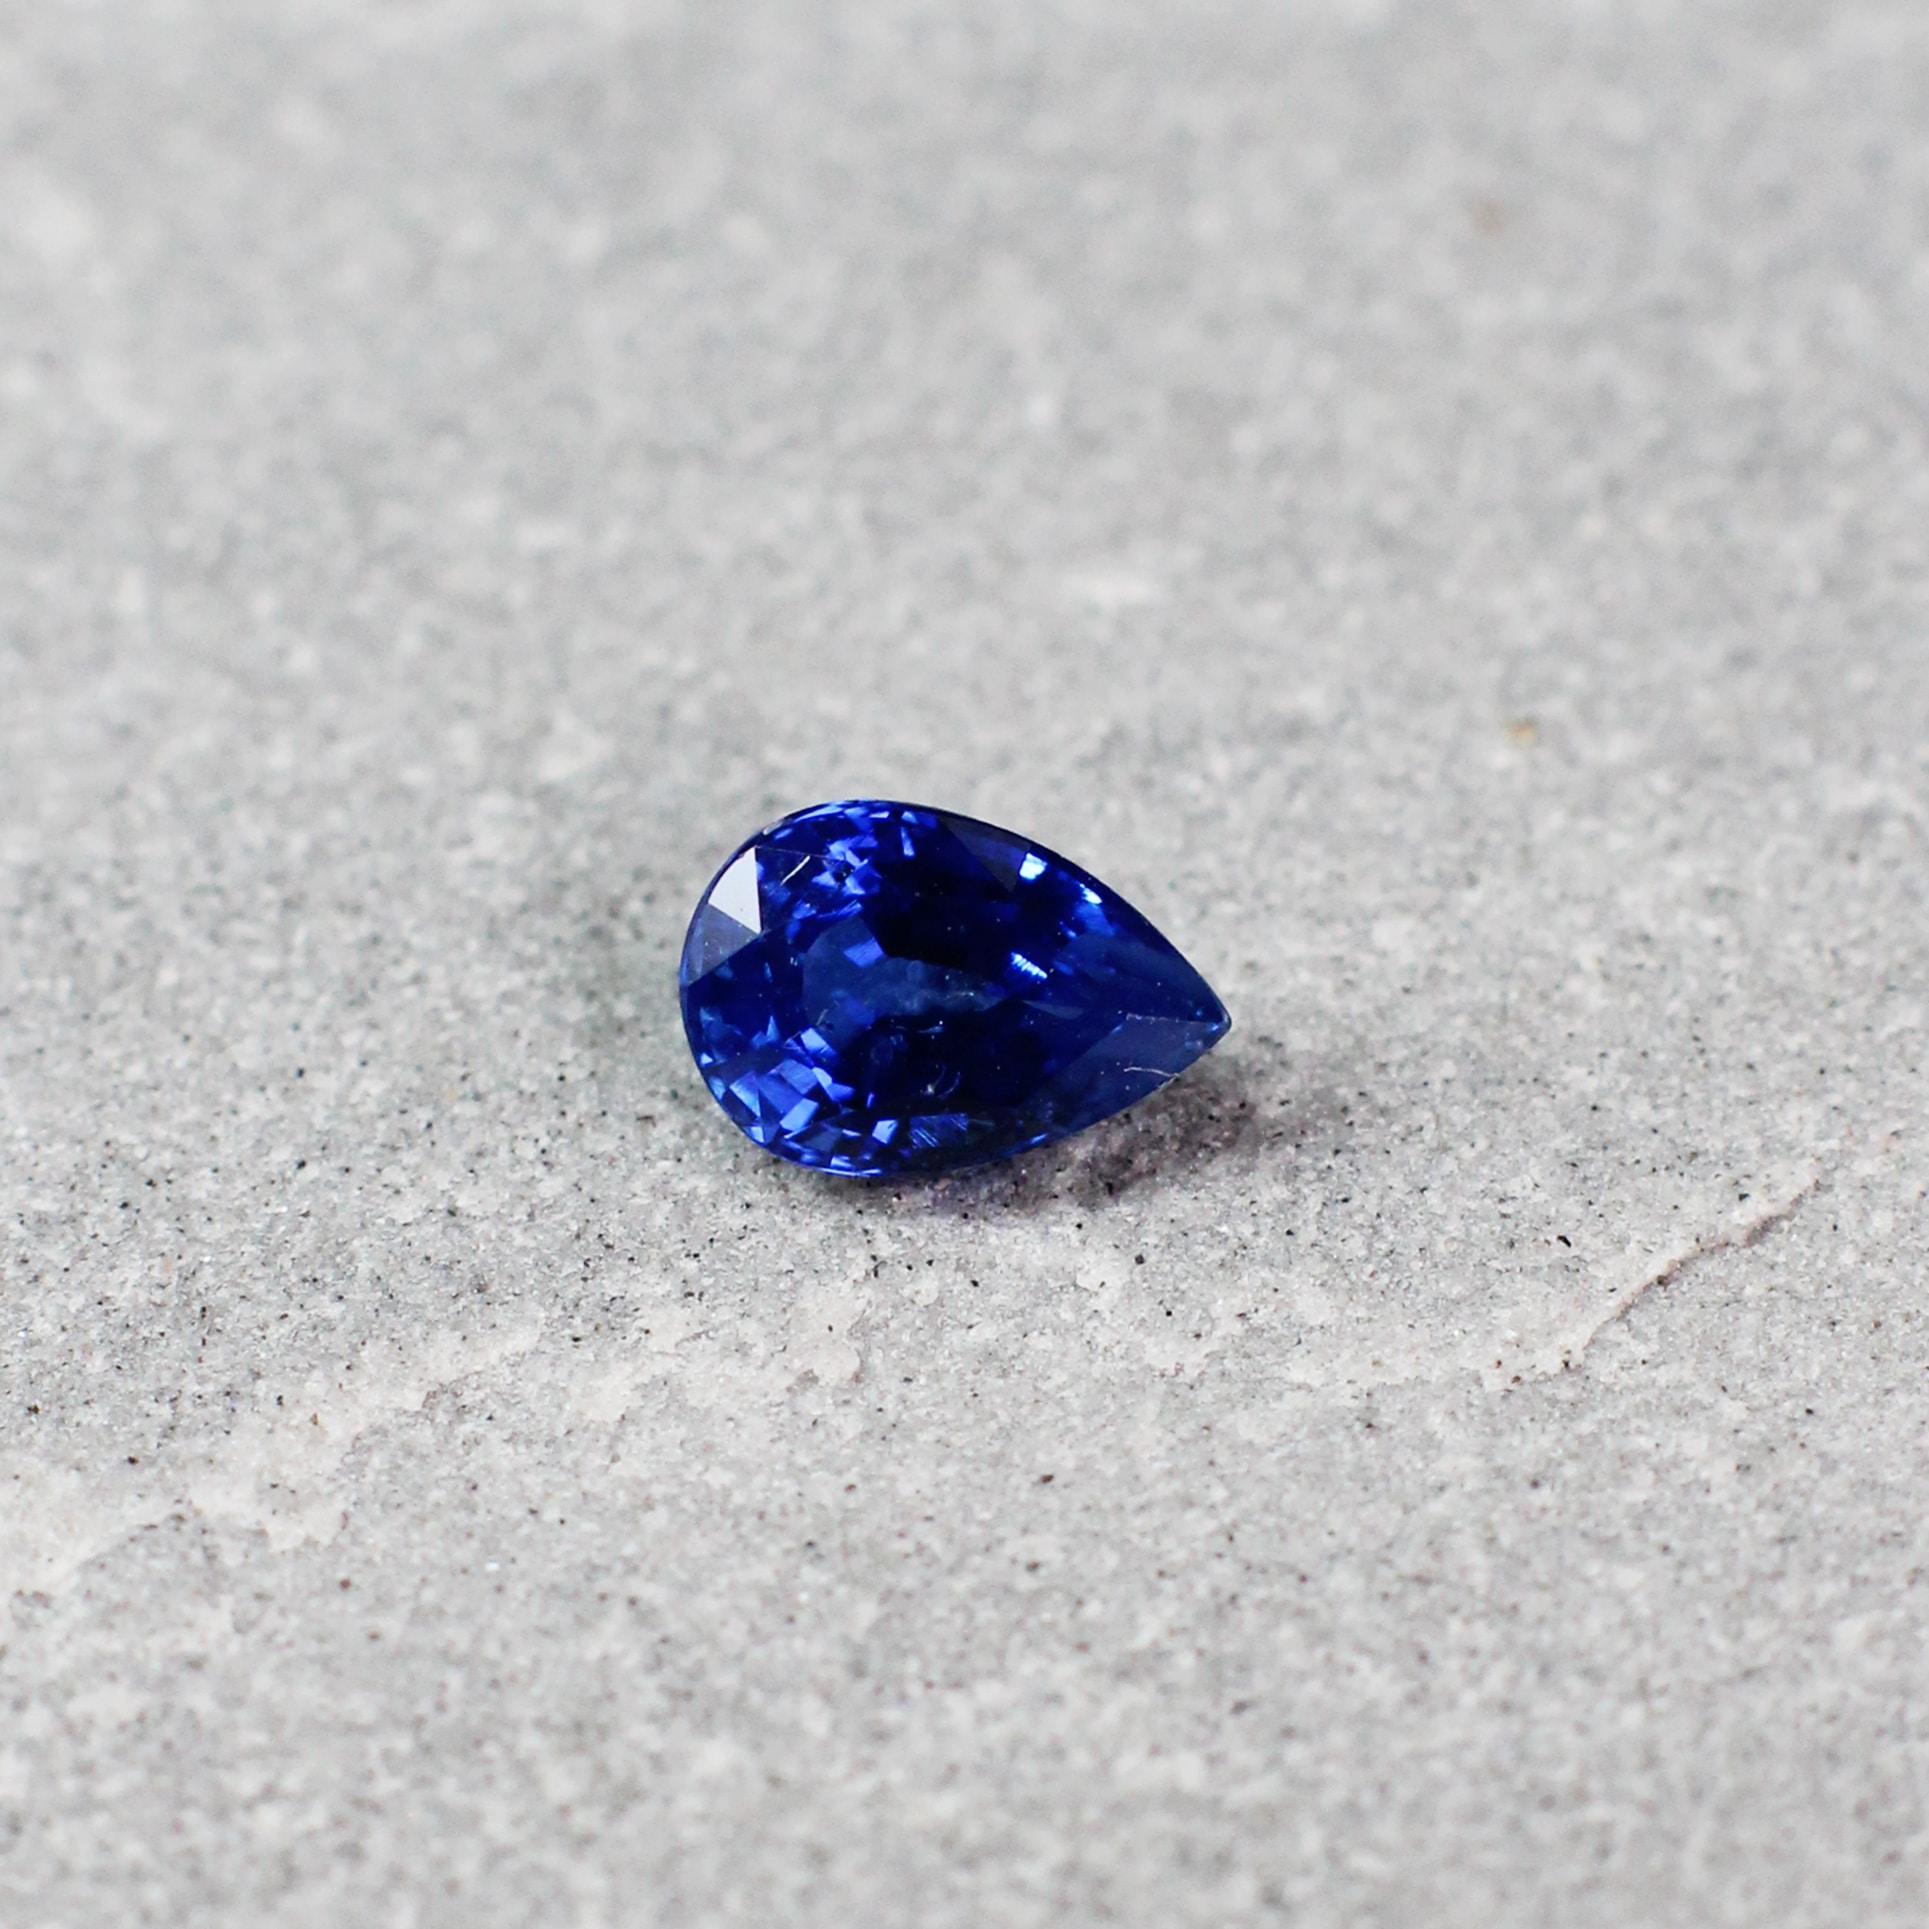 0.59 ct blue pear shape sapphire